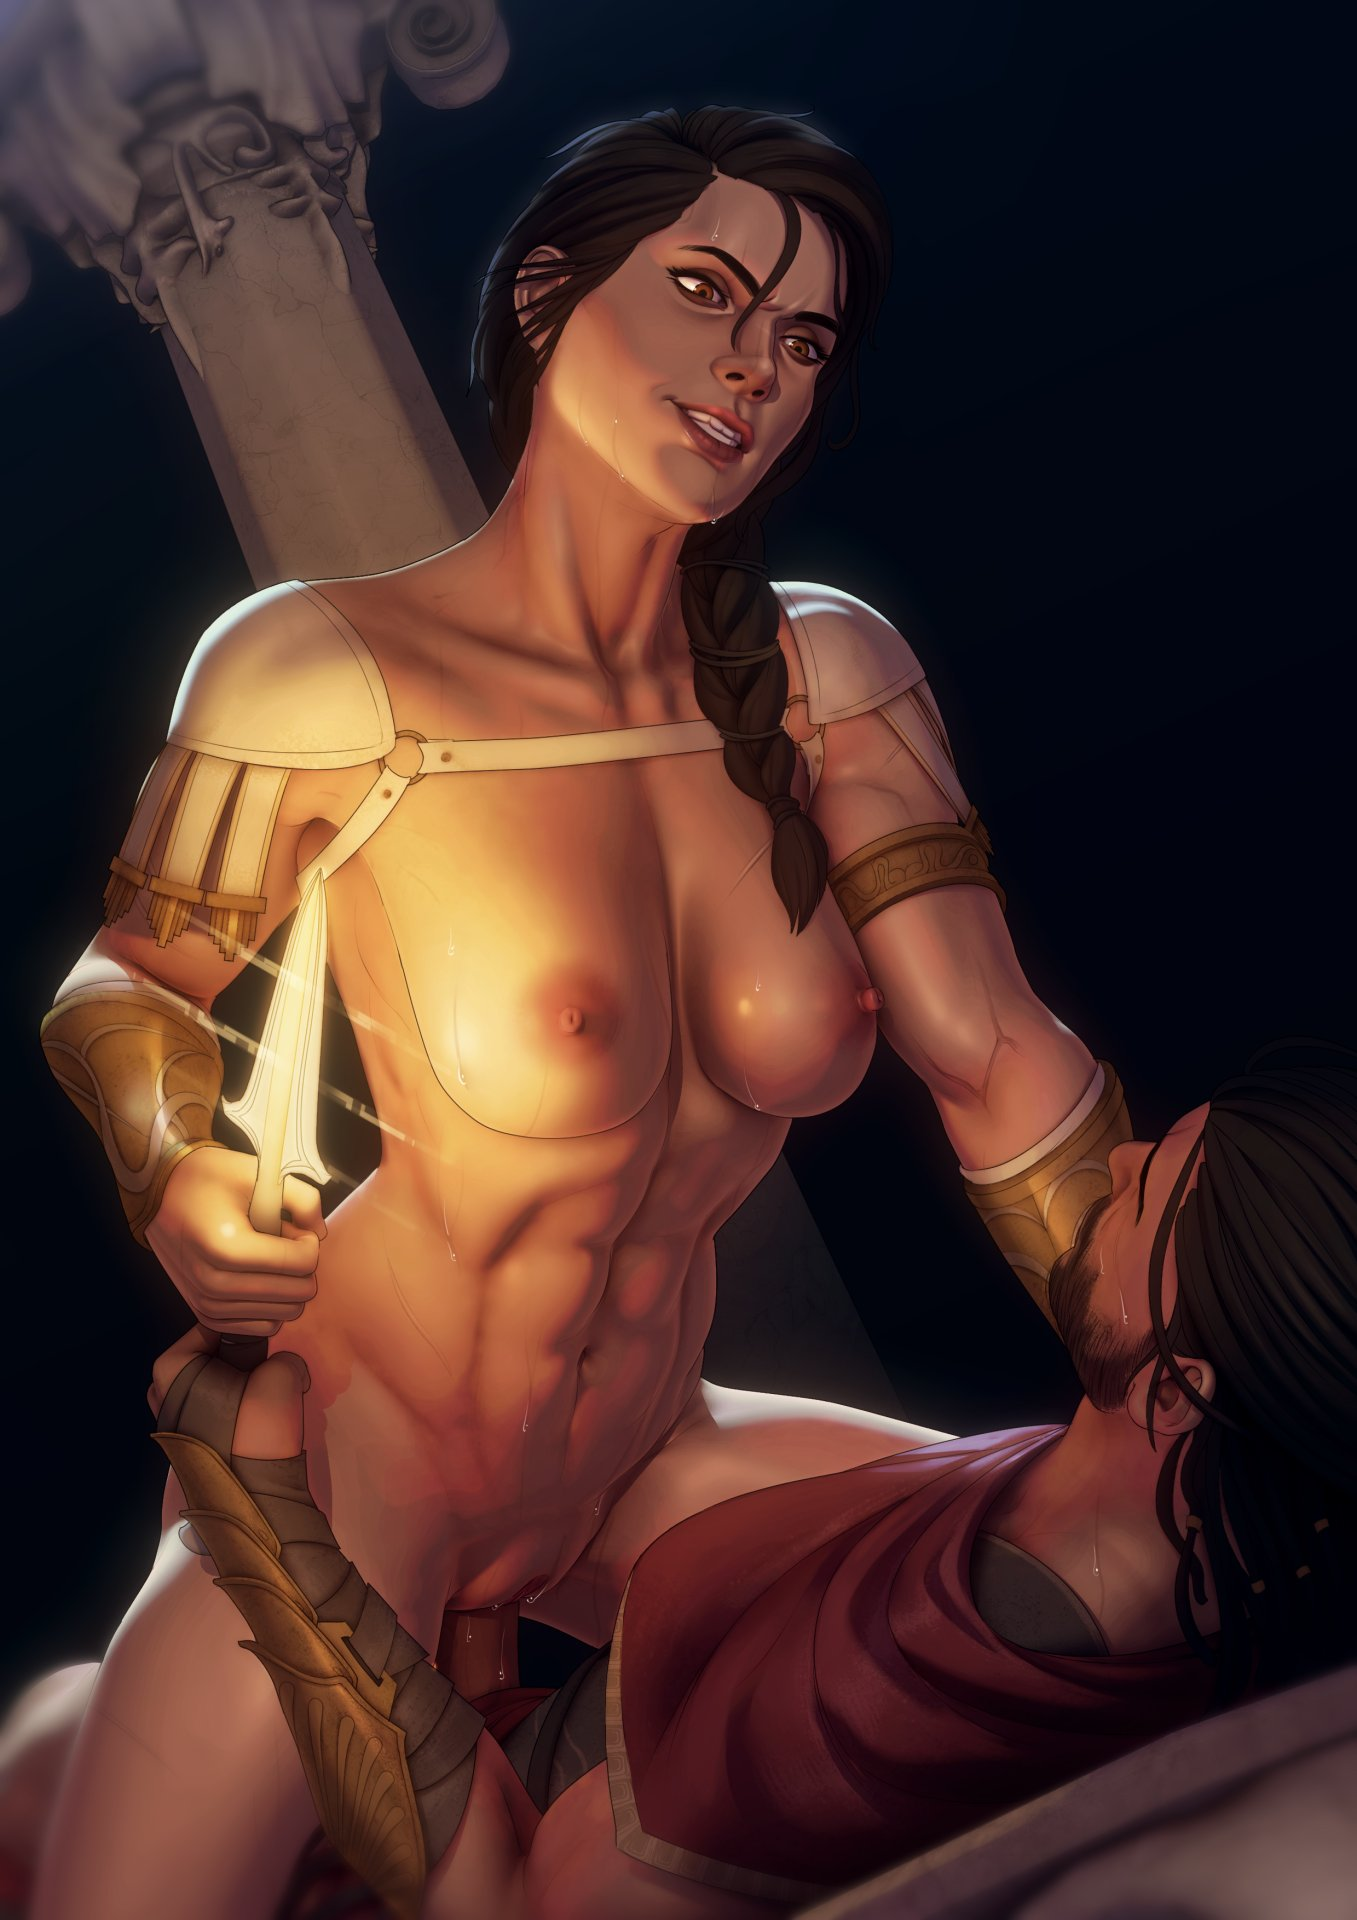 assassins odyssey creed Kono subarashii sekai ni shukufuku wo naked